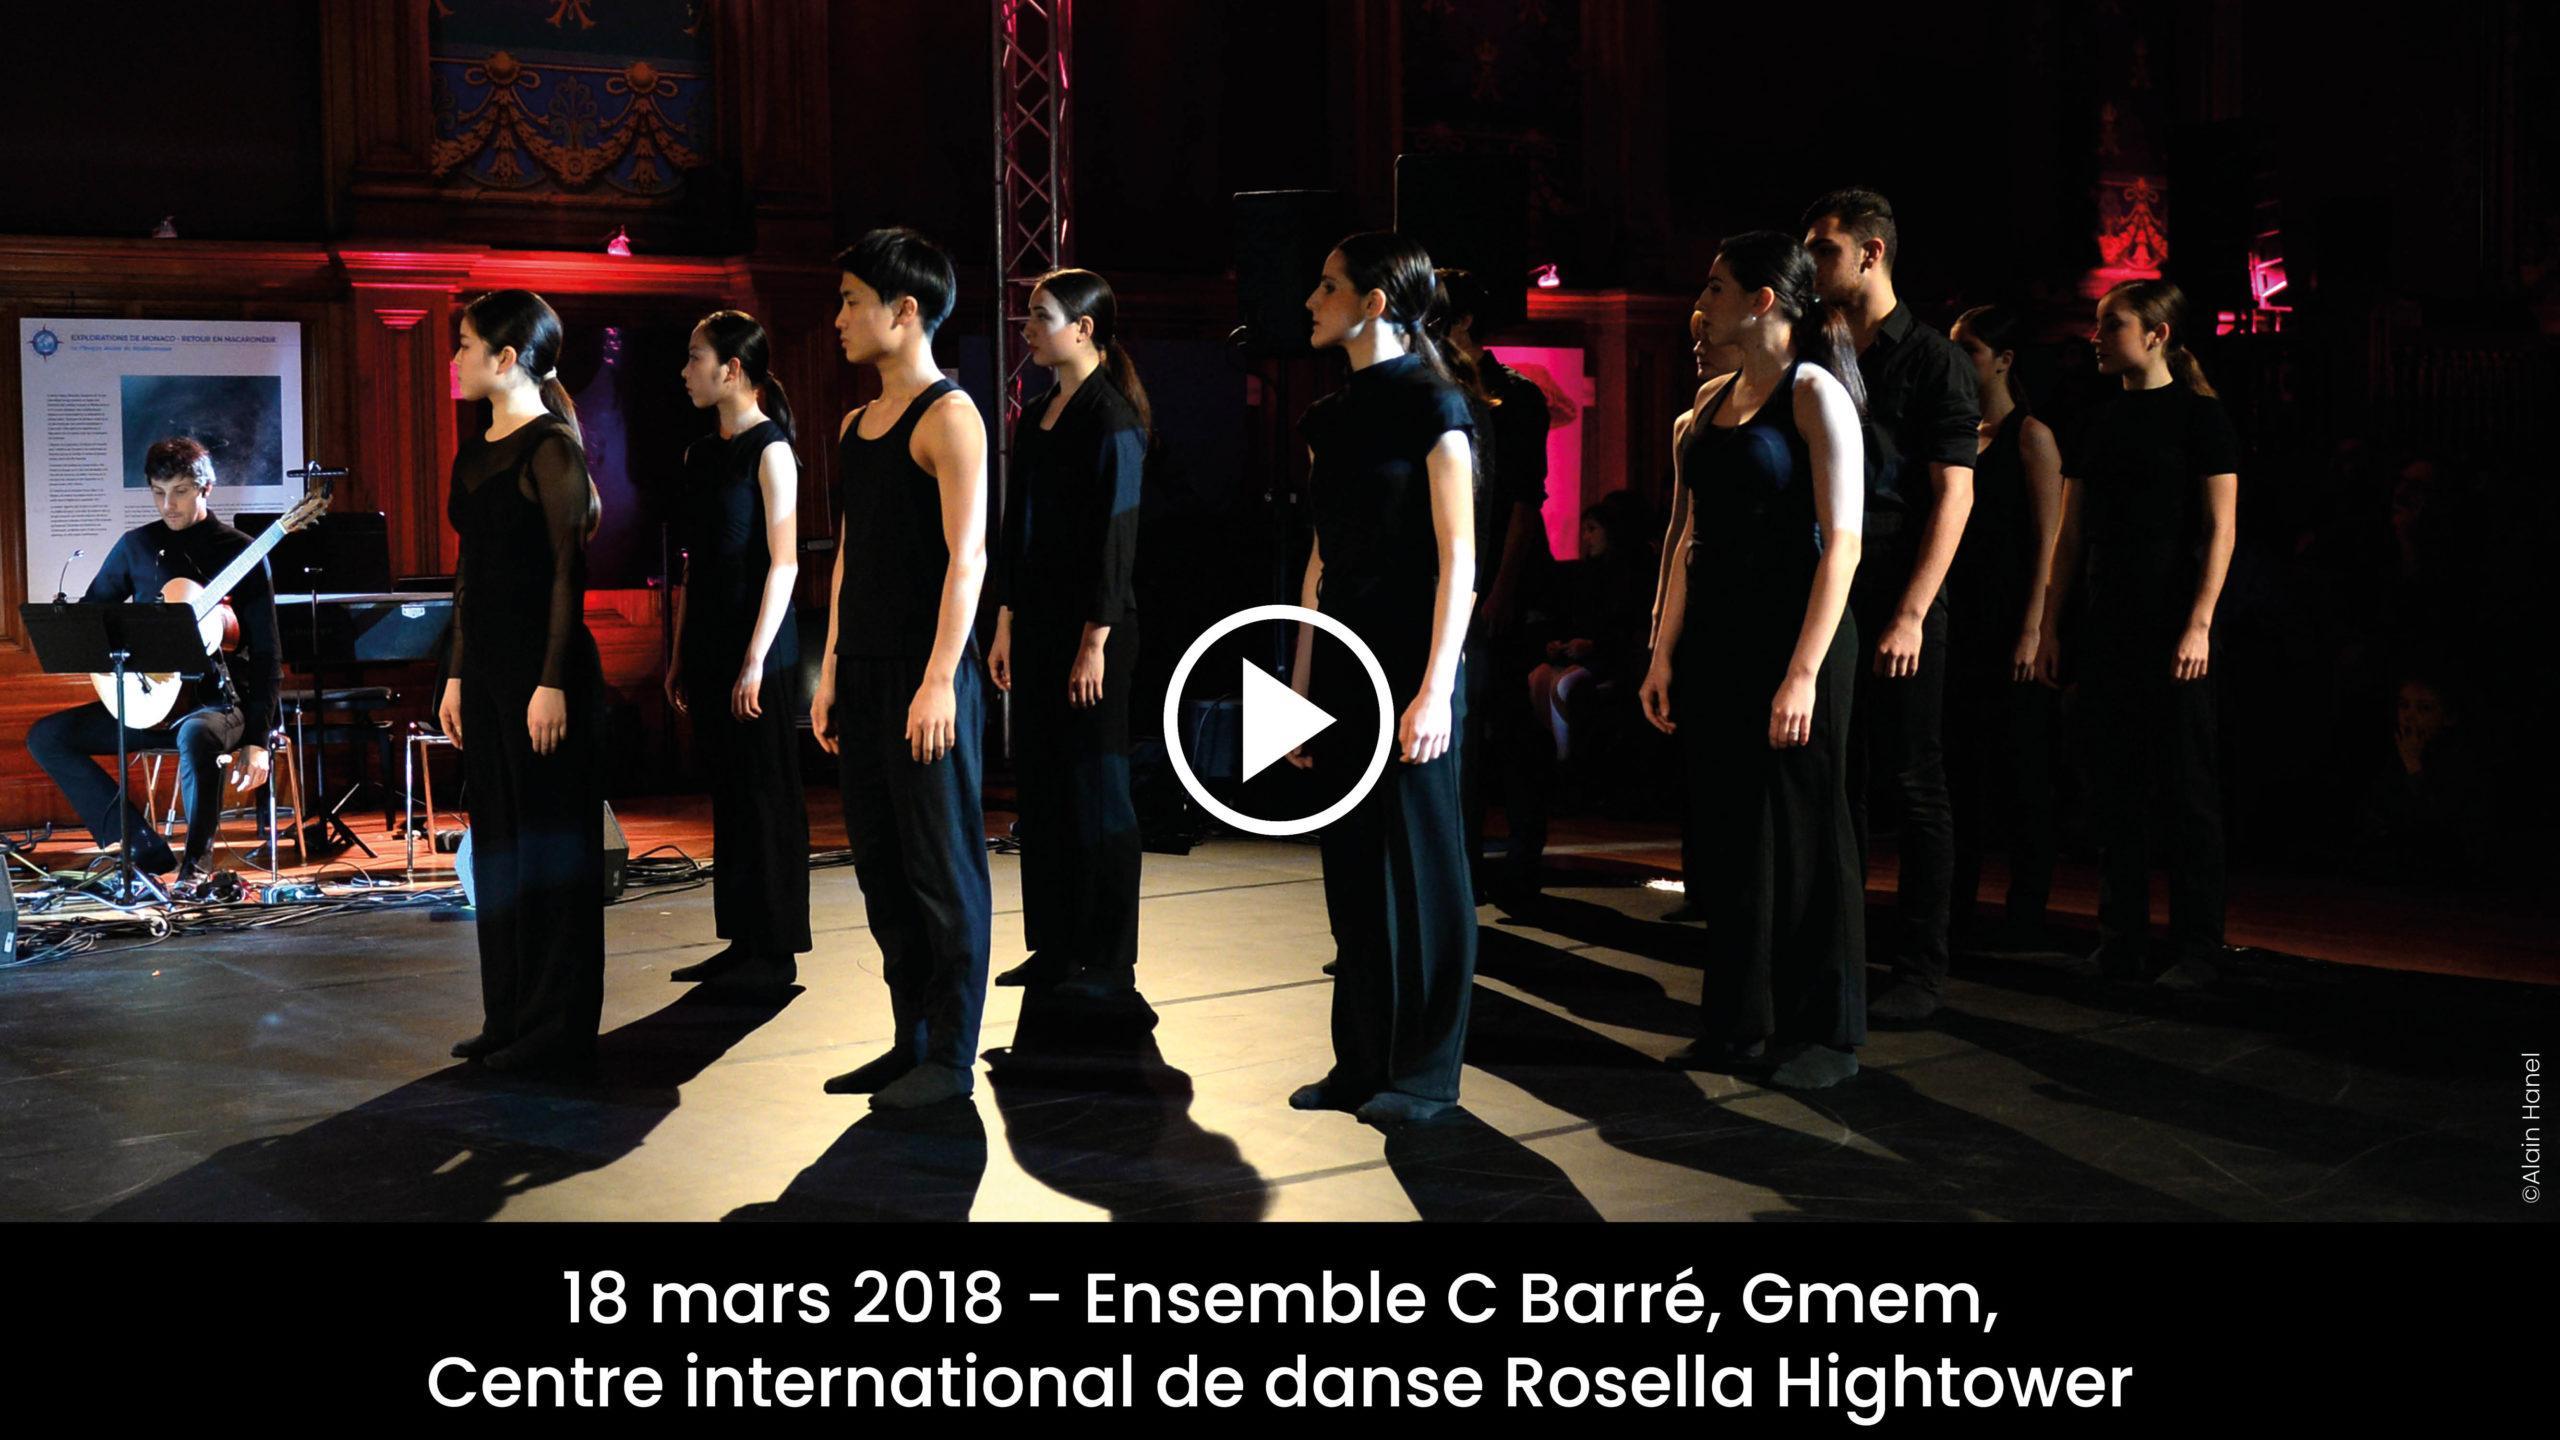 Monaco Music Forum – CBarré, gmem, Centre de danse Rosella Hightower